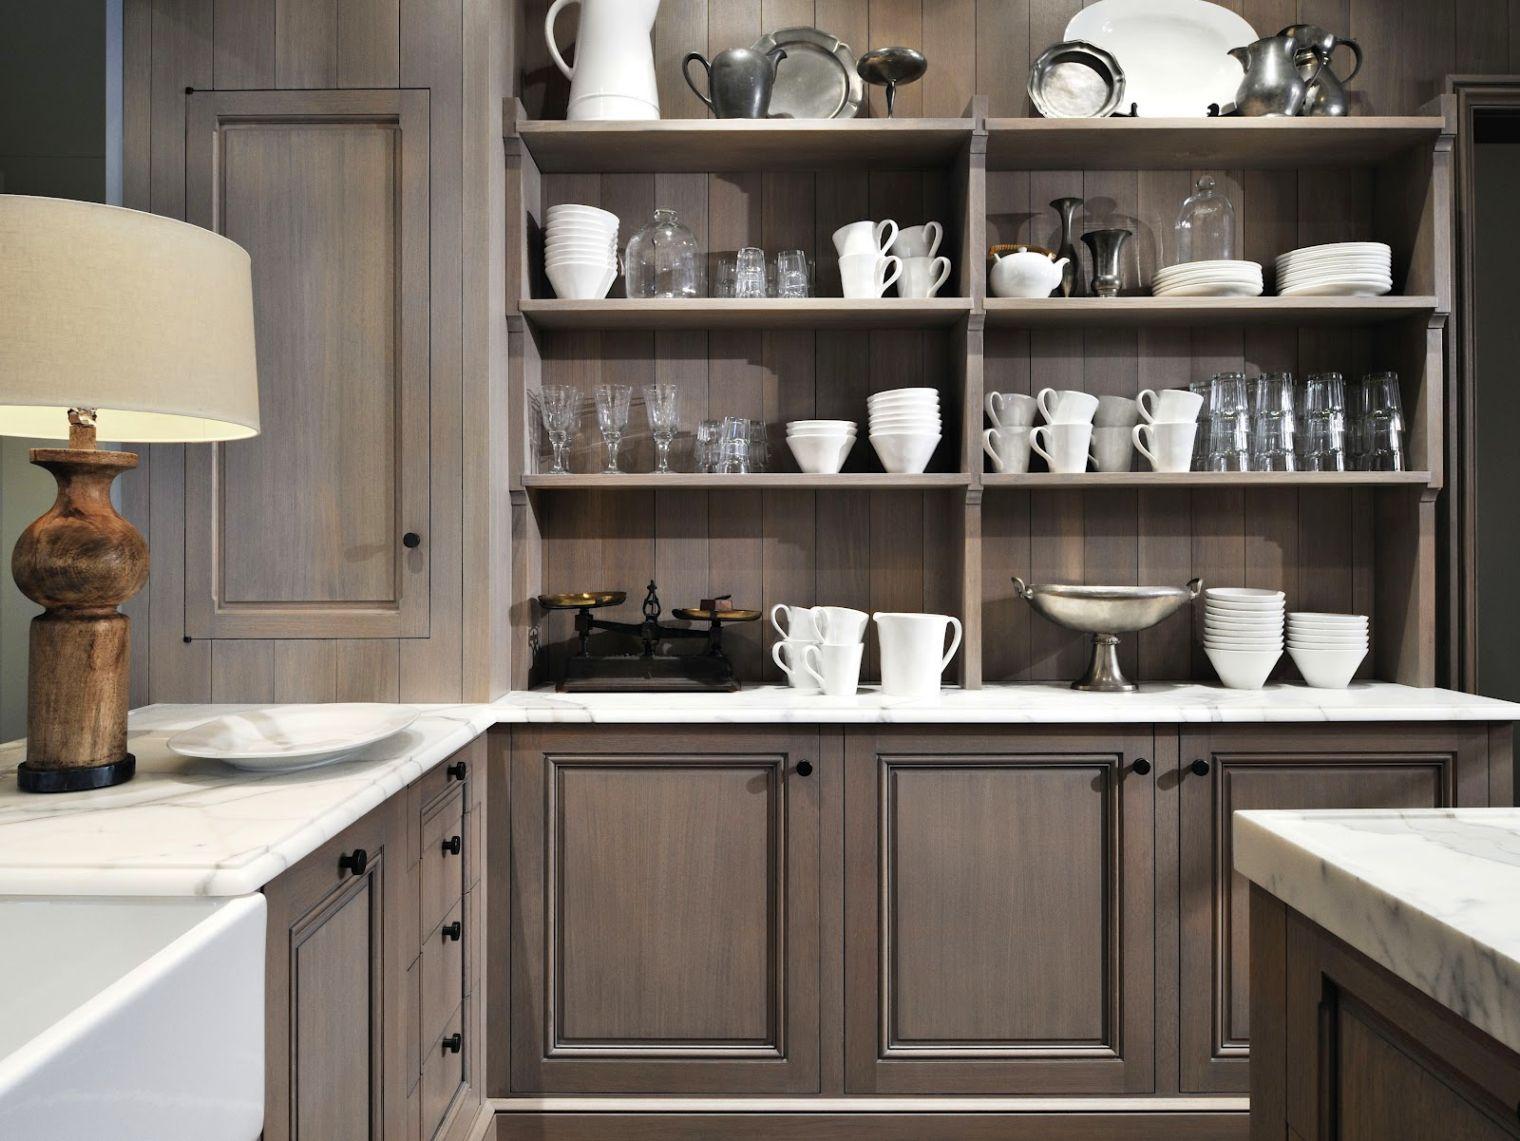 gray kitchen cabinets ideas photo - 5